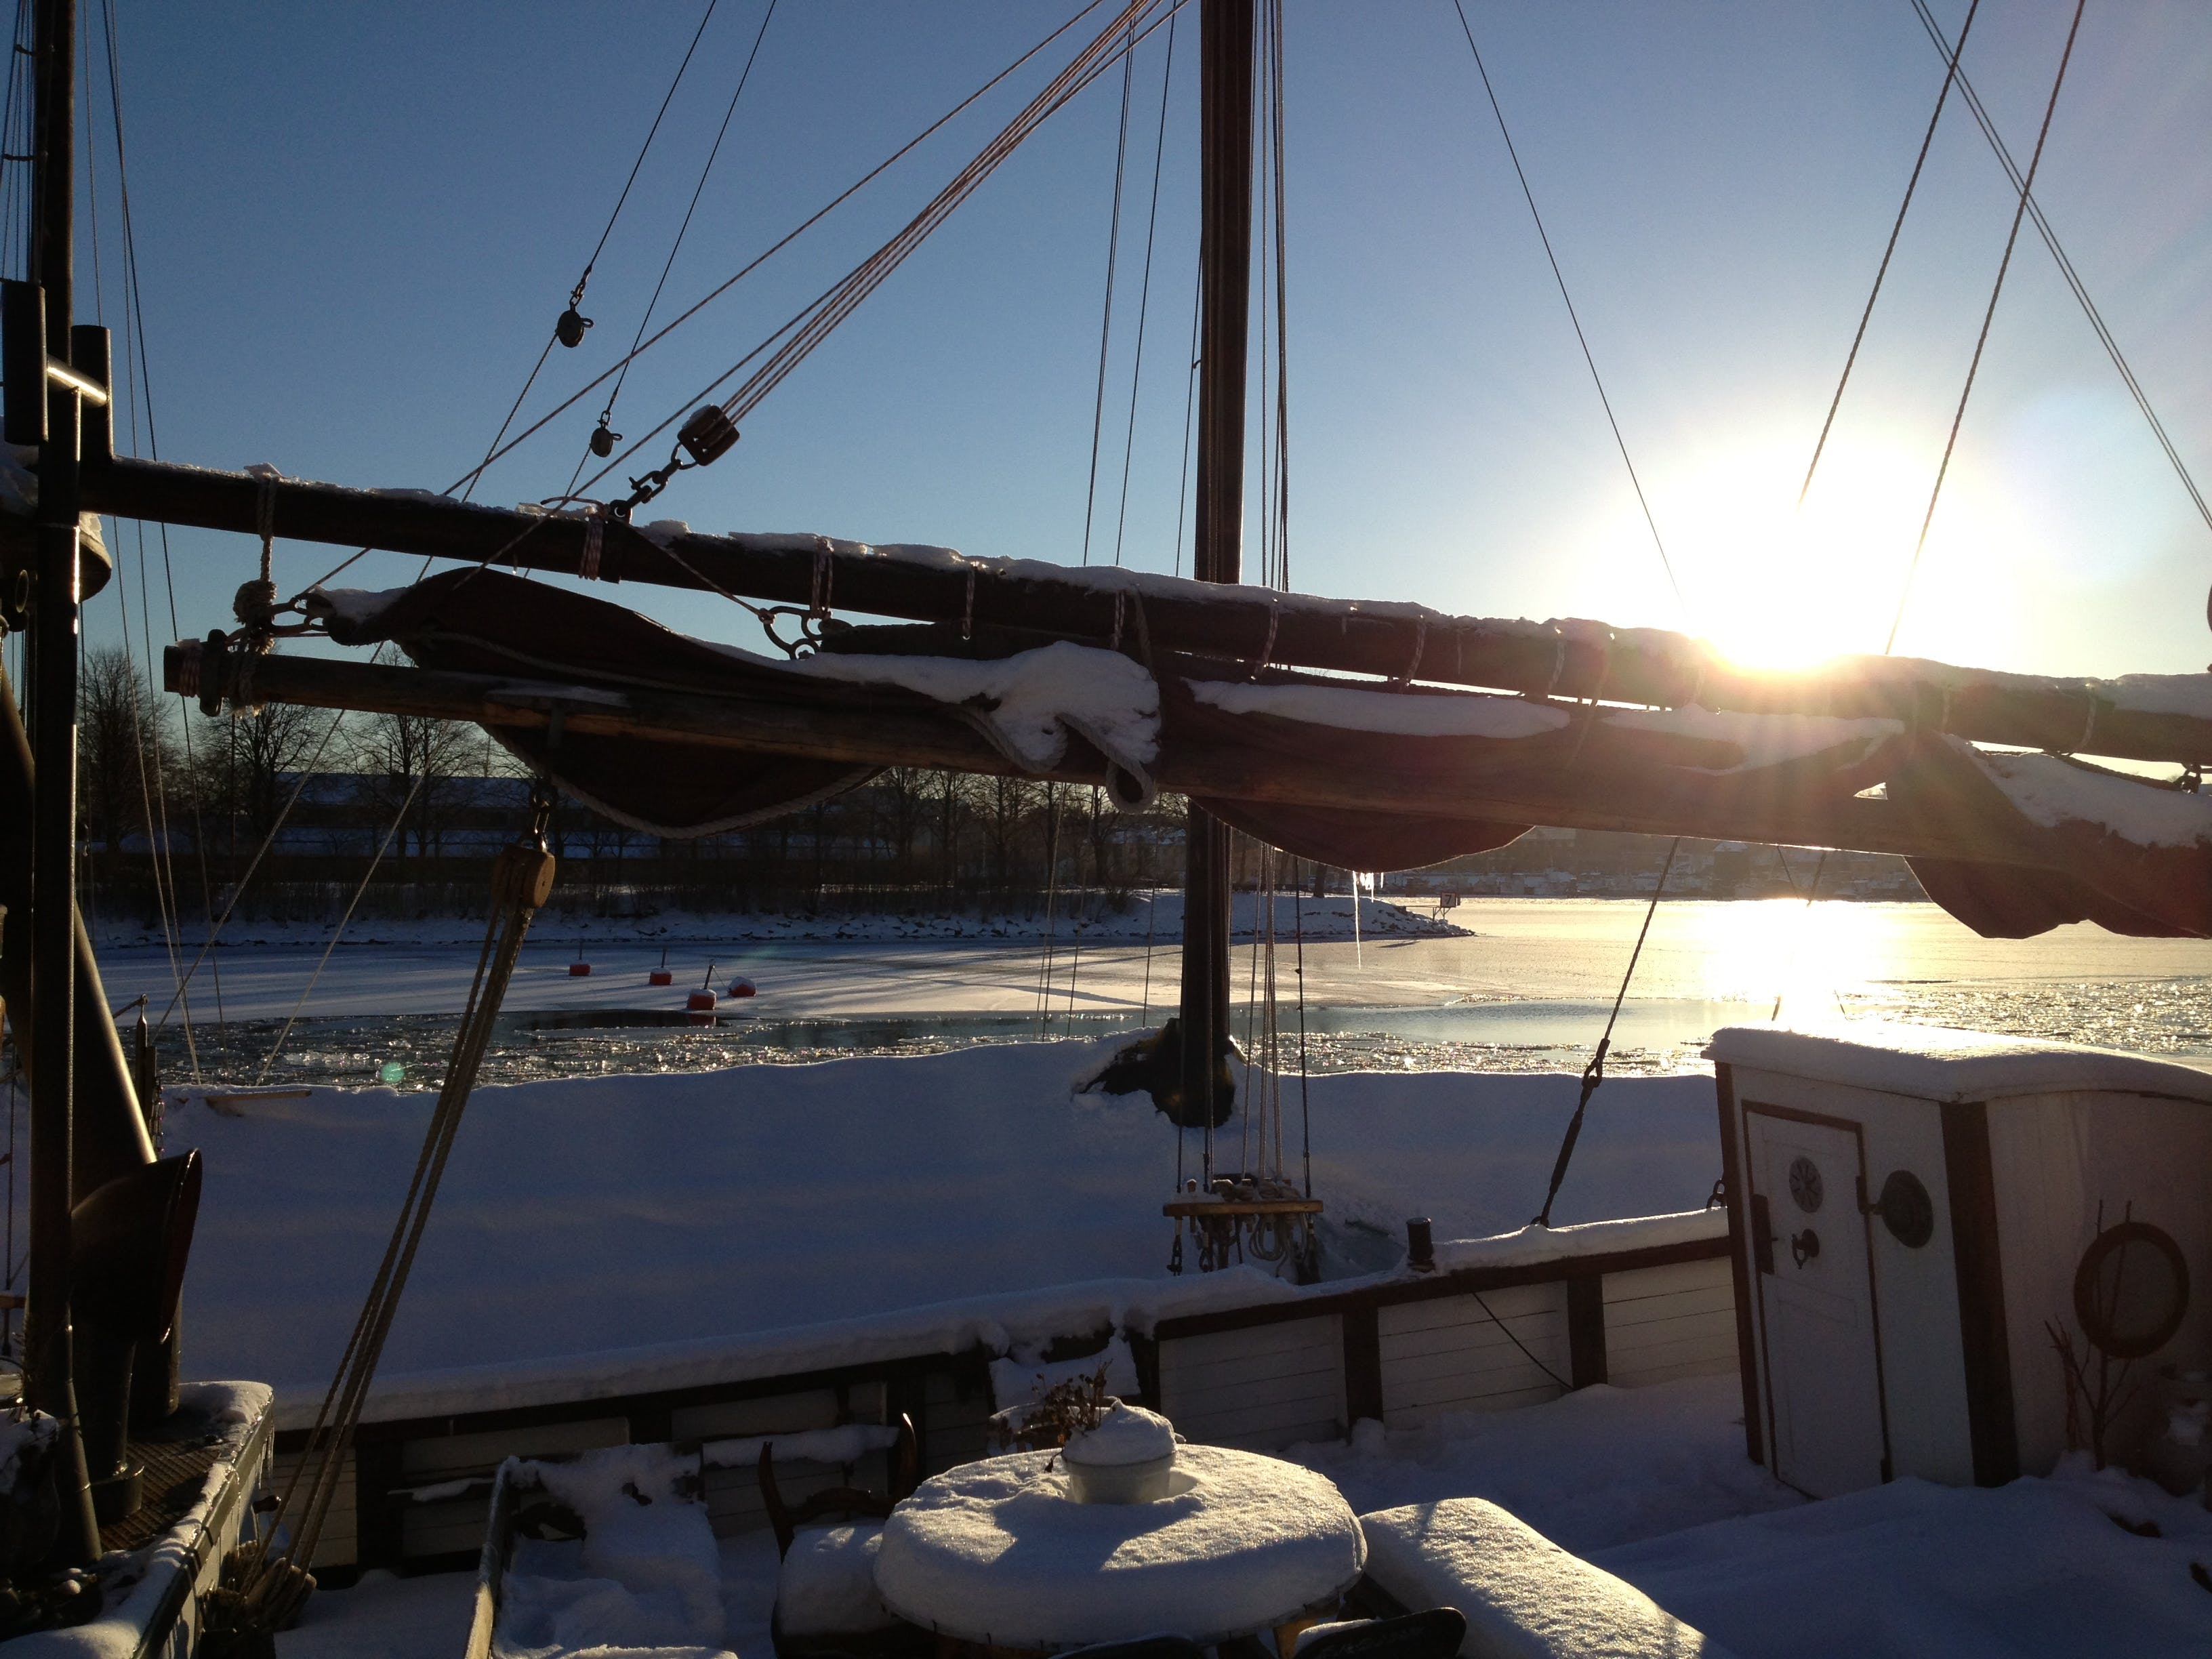 Free stock photo of sun, boat, winter, ice